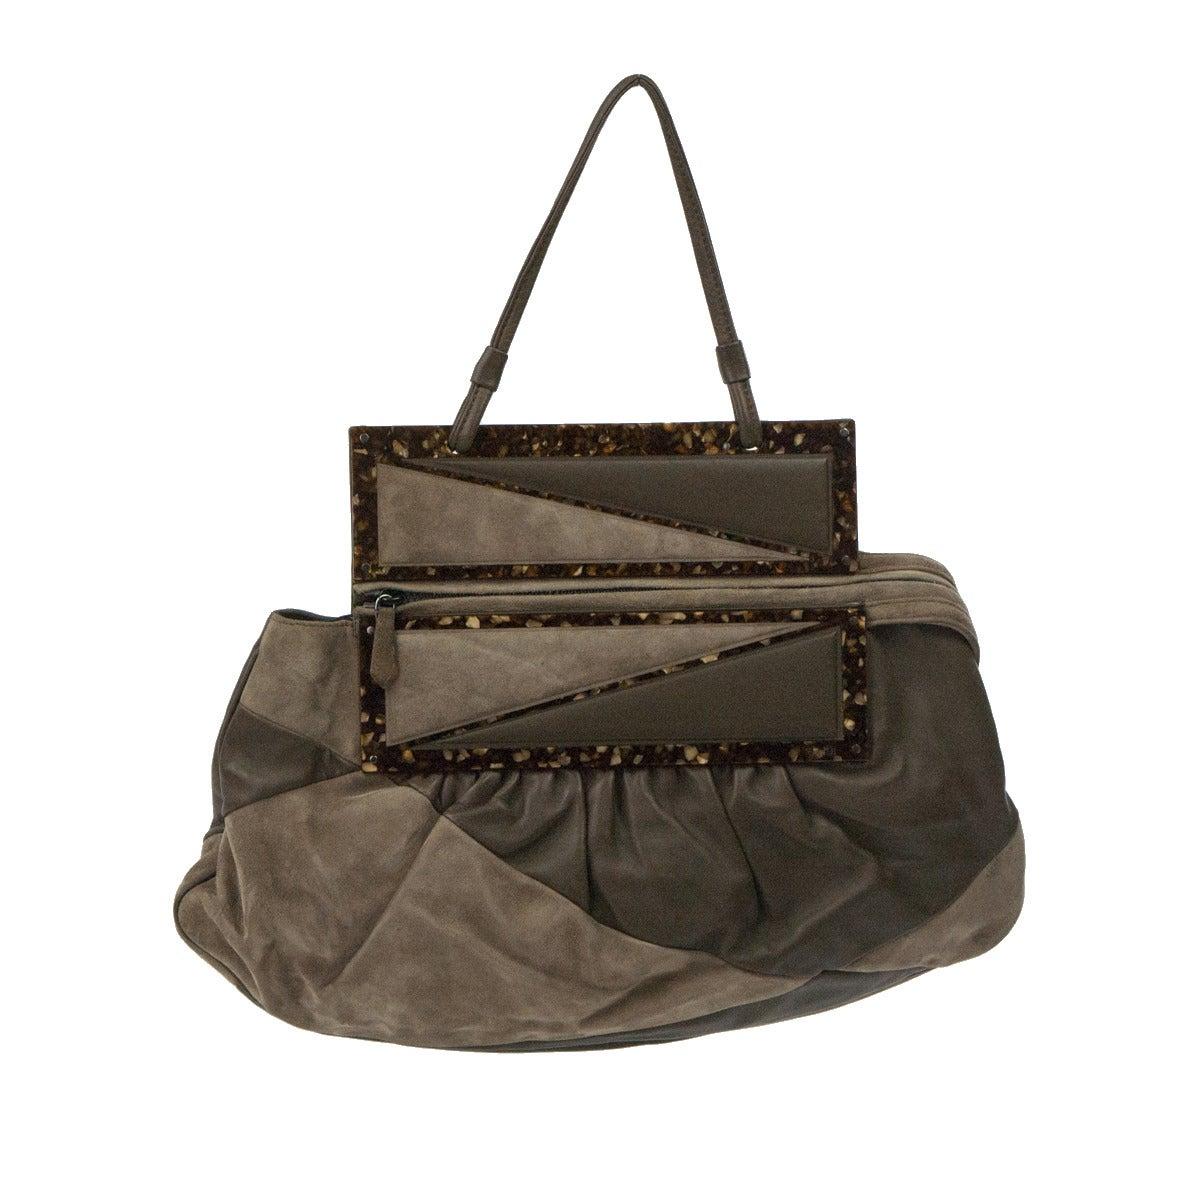 Fendi Leather and Buckskin Turtledove One Handle Bag